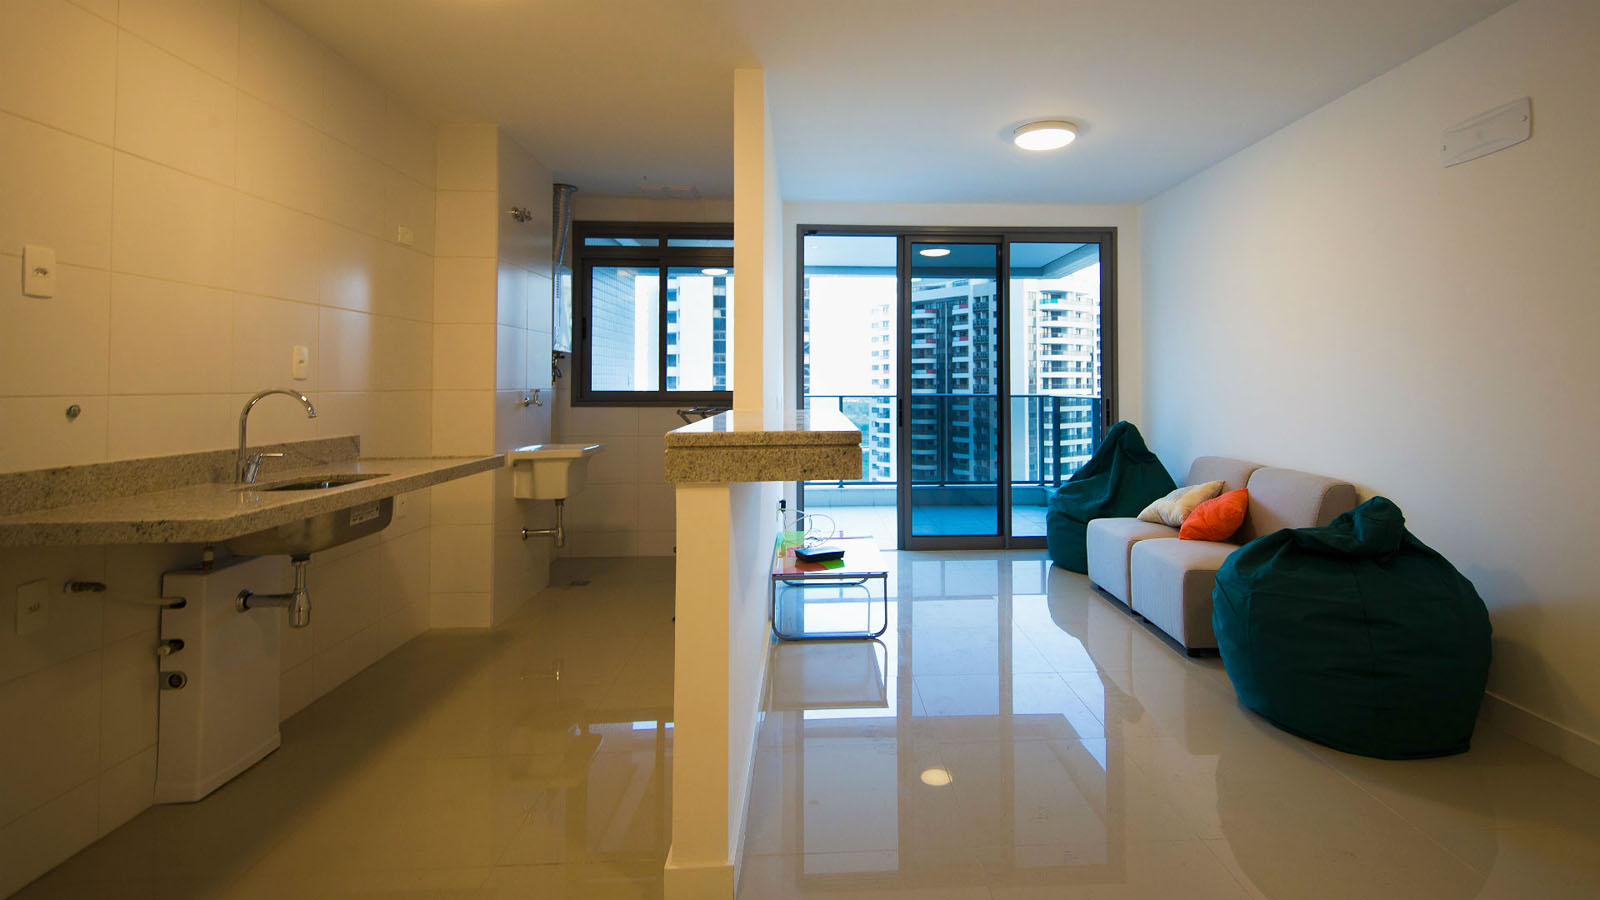 Rio Olympic Athletes Apartment